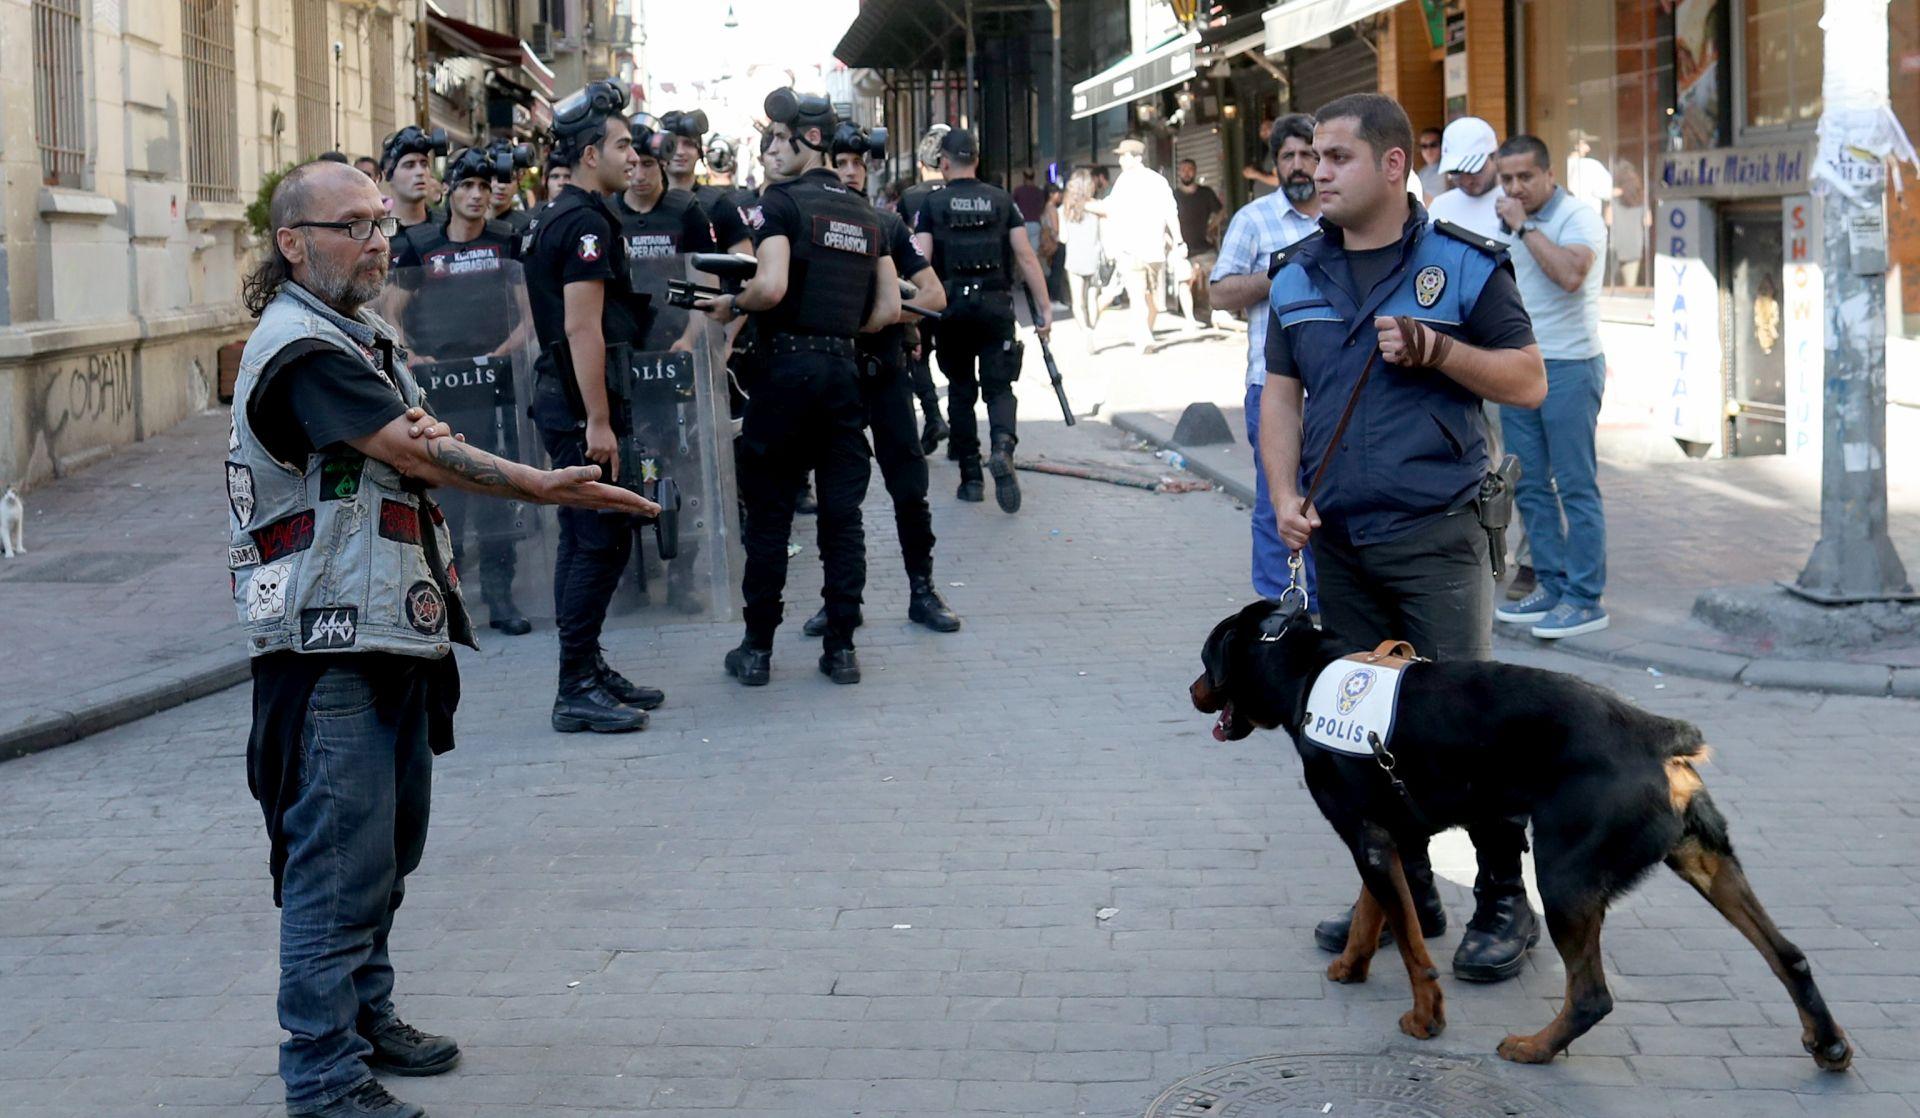 Turska uhitila 54 osobe zbog povezanosti s IS-om